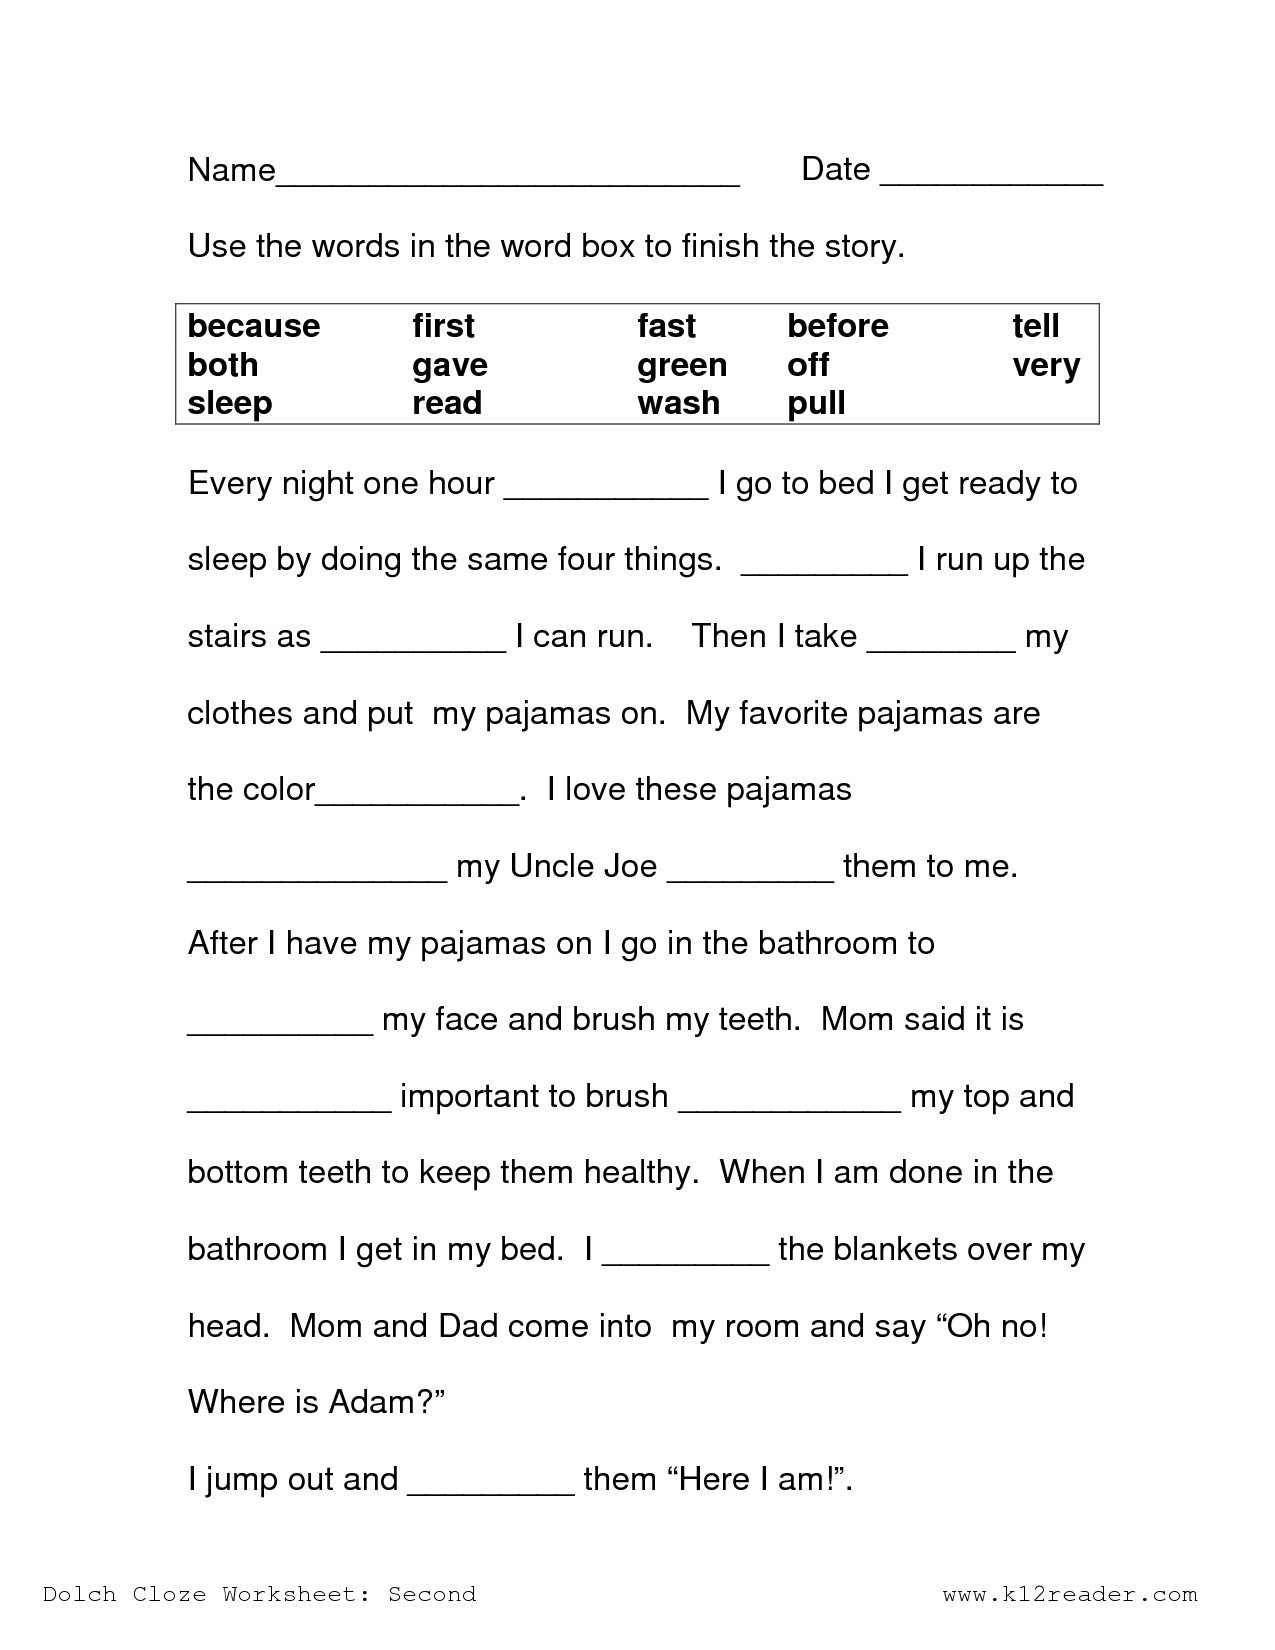 Math Worksheet: 2Nd Grade Science Worksheets Free Printable Easy   Science Worksheets For 4Th Grade Free Printable